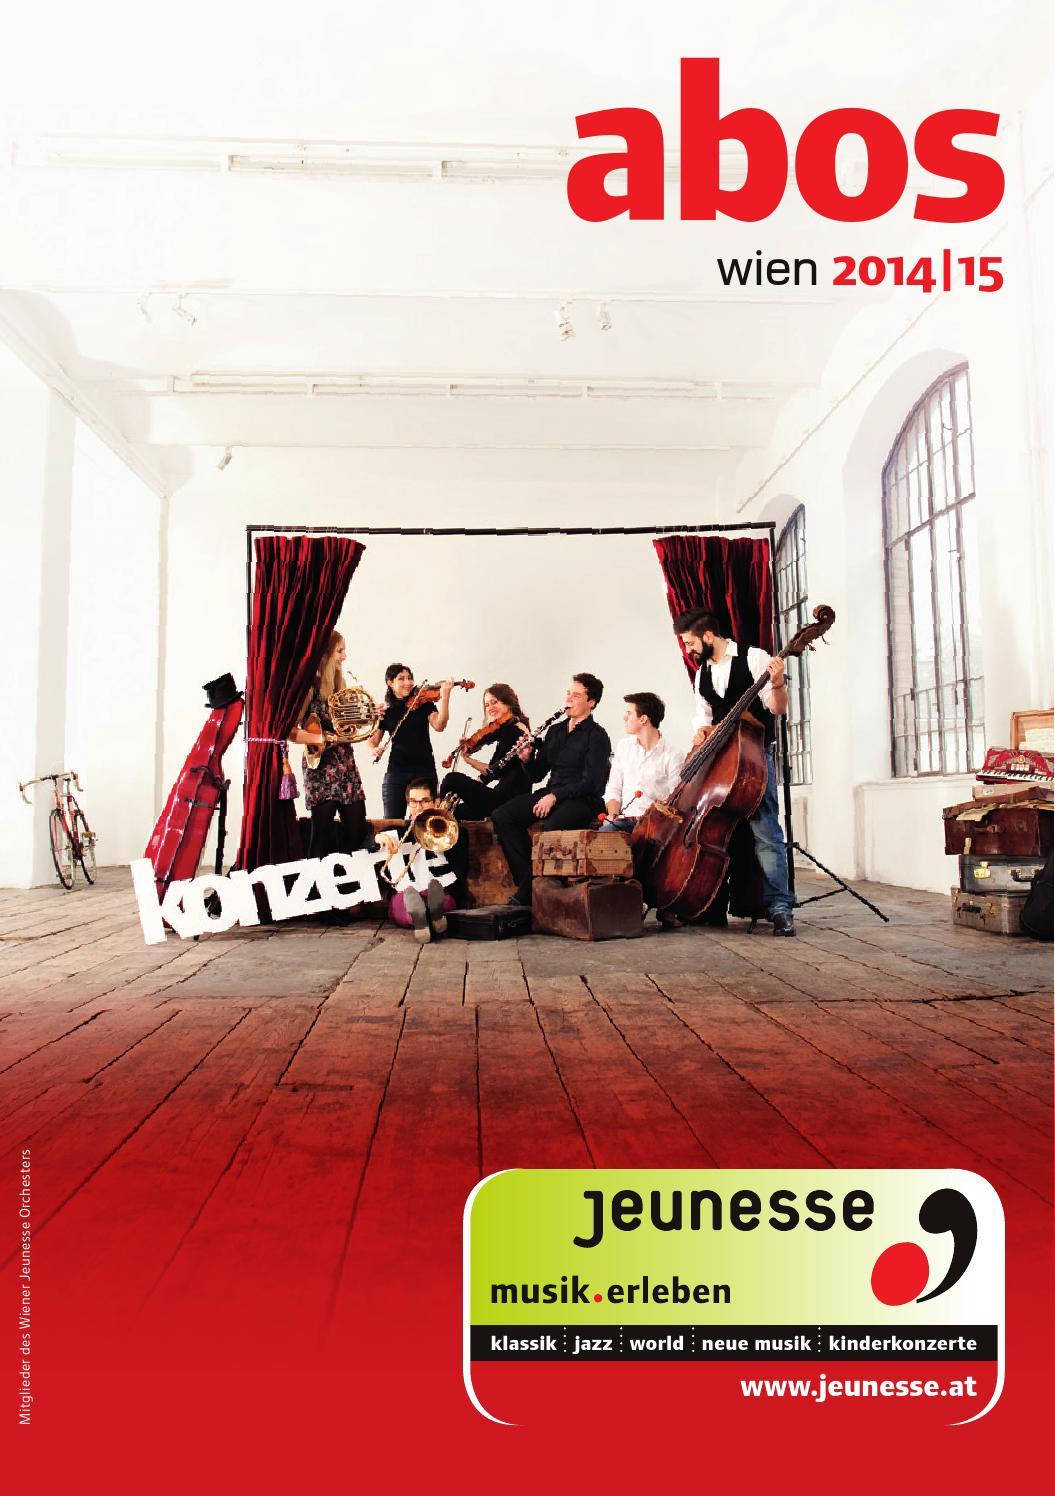 Jeunesse Wien Abos 2014 15 By Jeunesse Musikalische Jugend